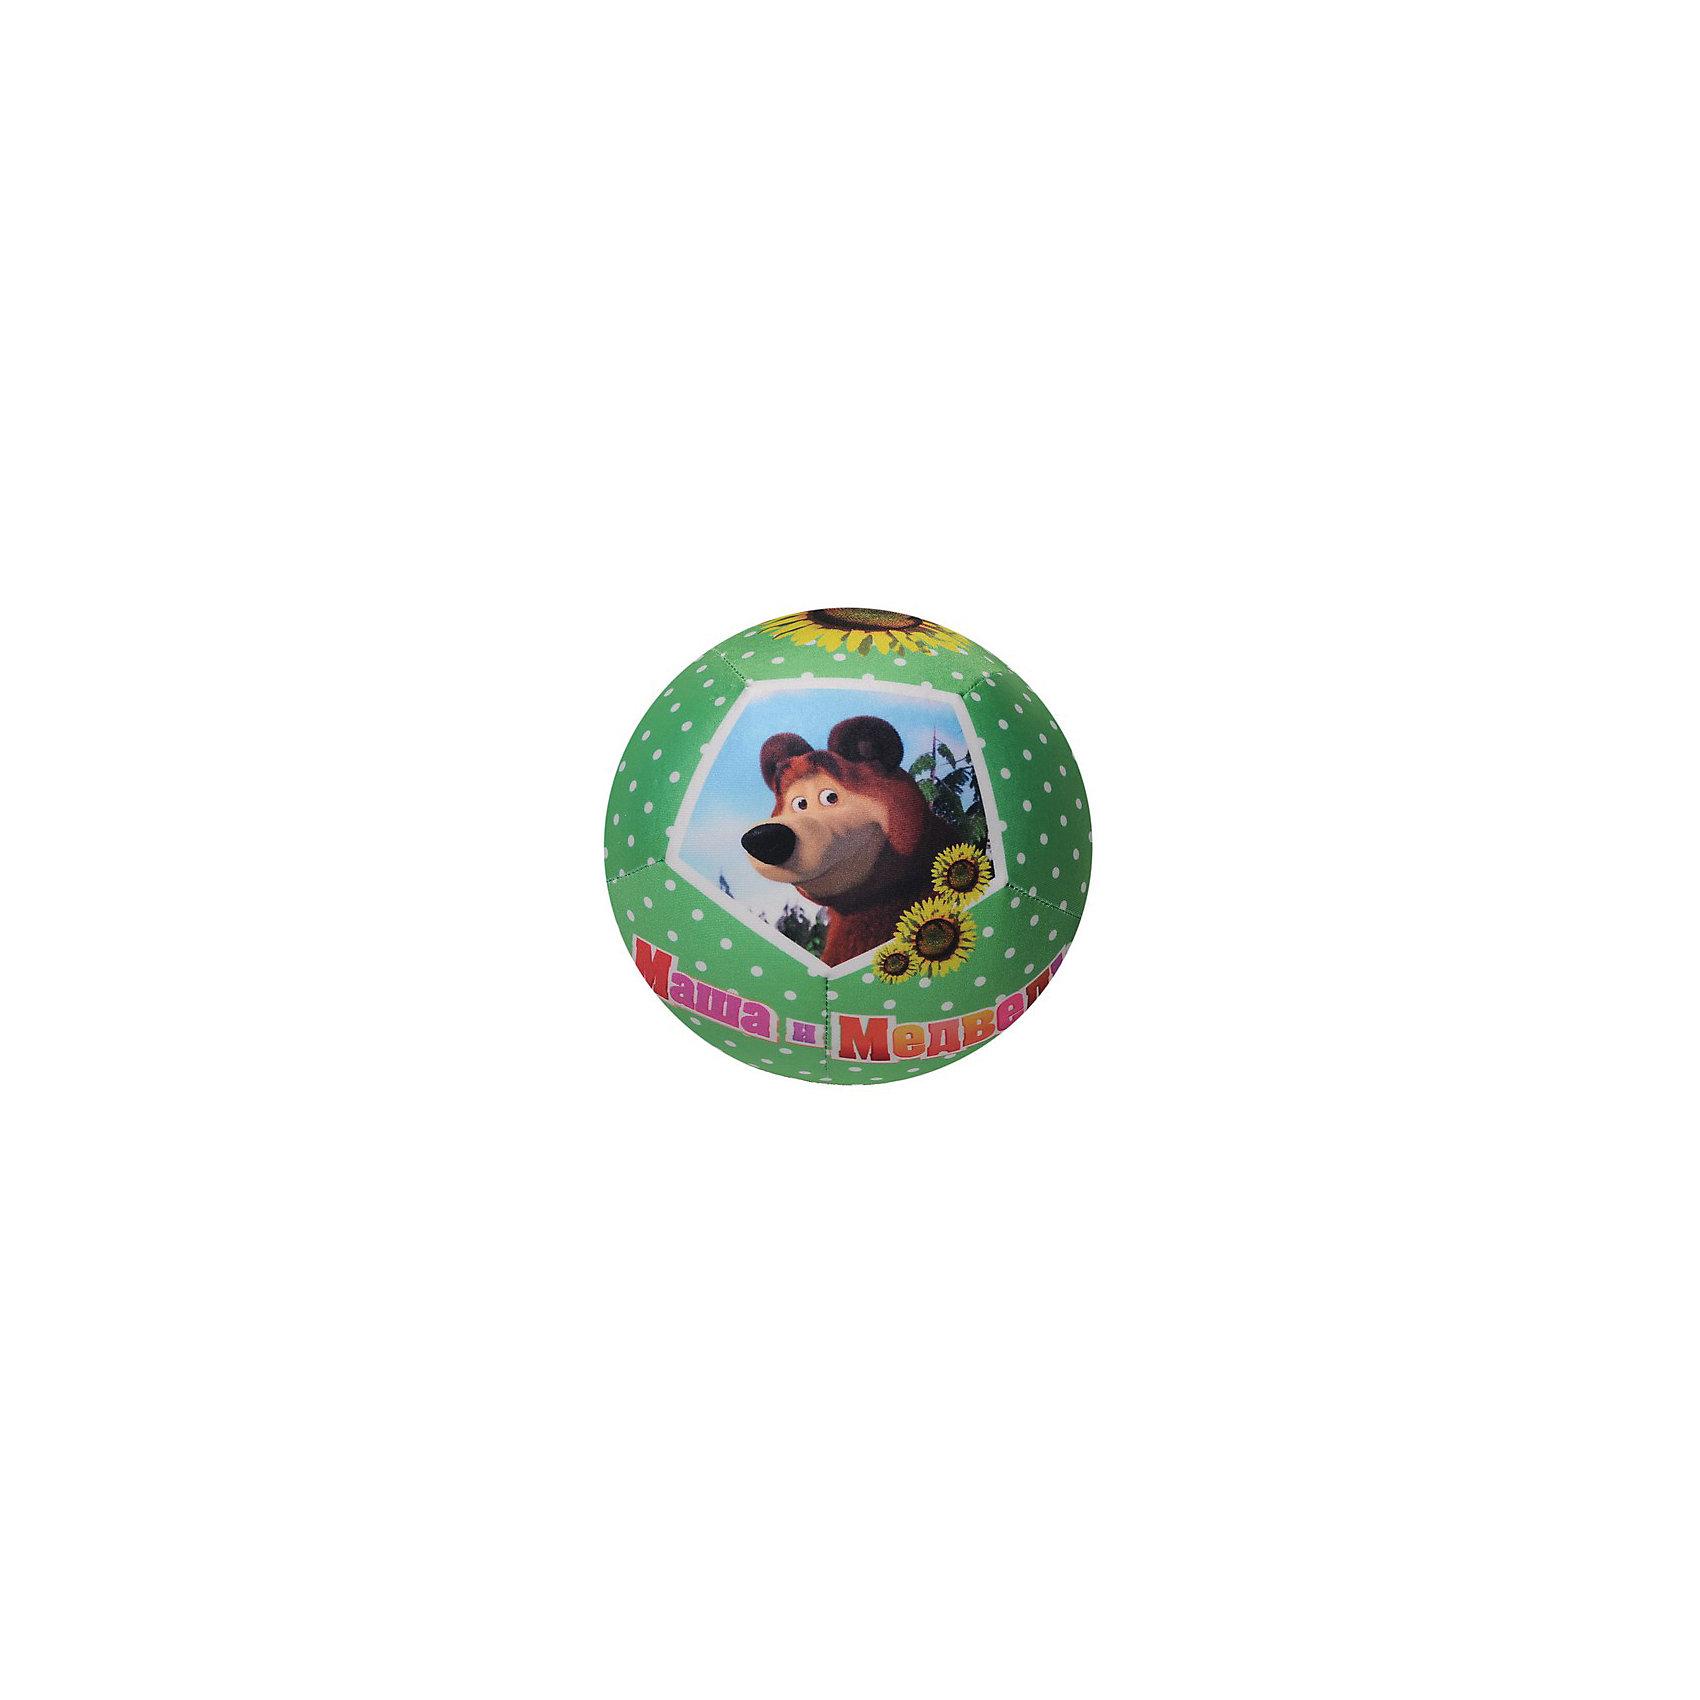 СмолТойс Мяч-антистресс Маша и медведь сувенир мяч антистресс